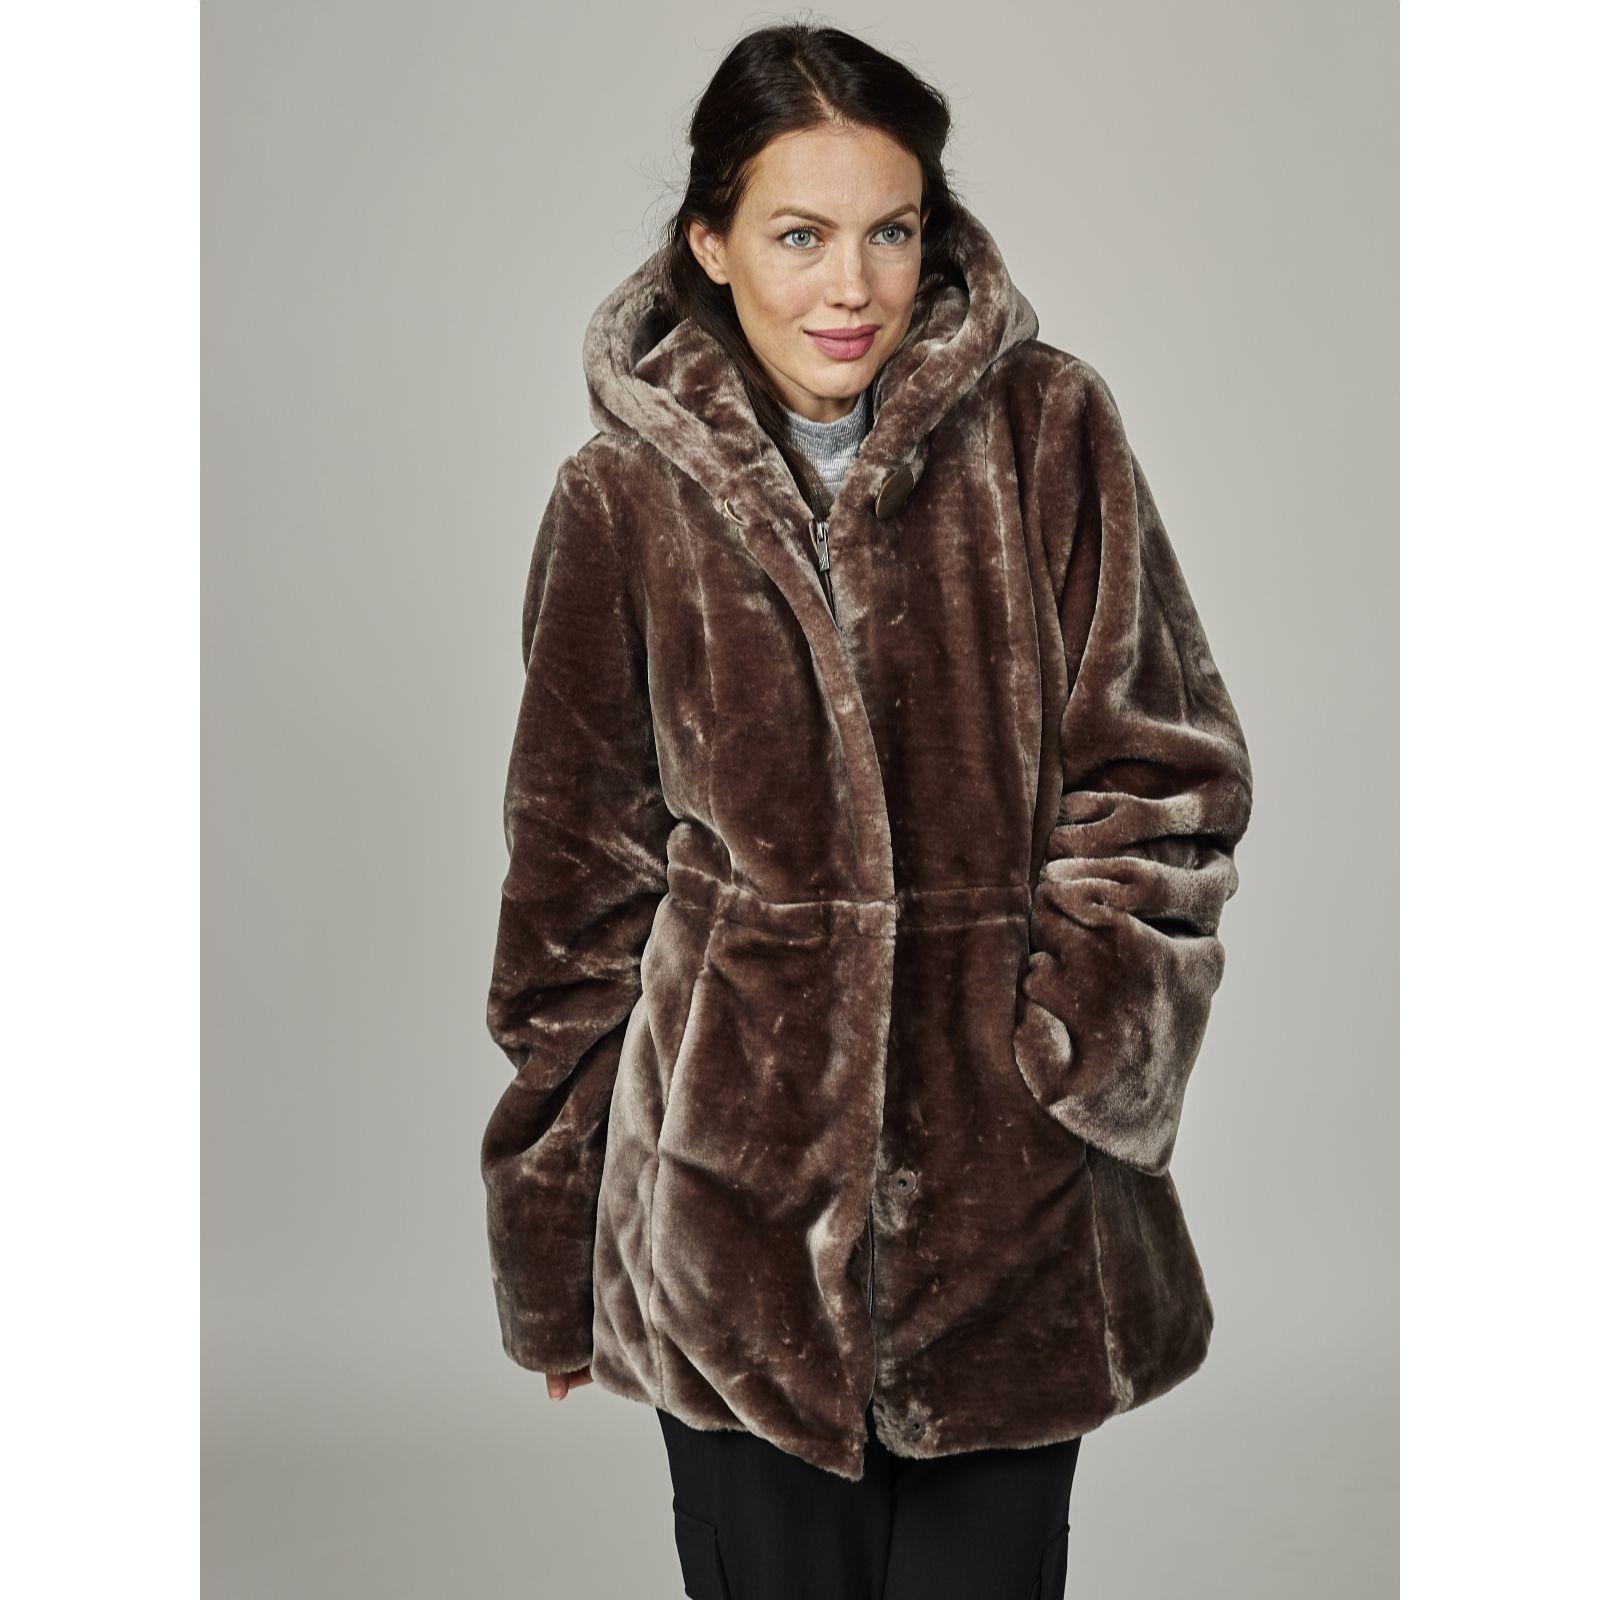 511de4189da88 Dennis Basso Faux Fur Hooded Coat with Print Lining   Drawstring Waist -  QVC UK